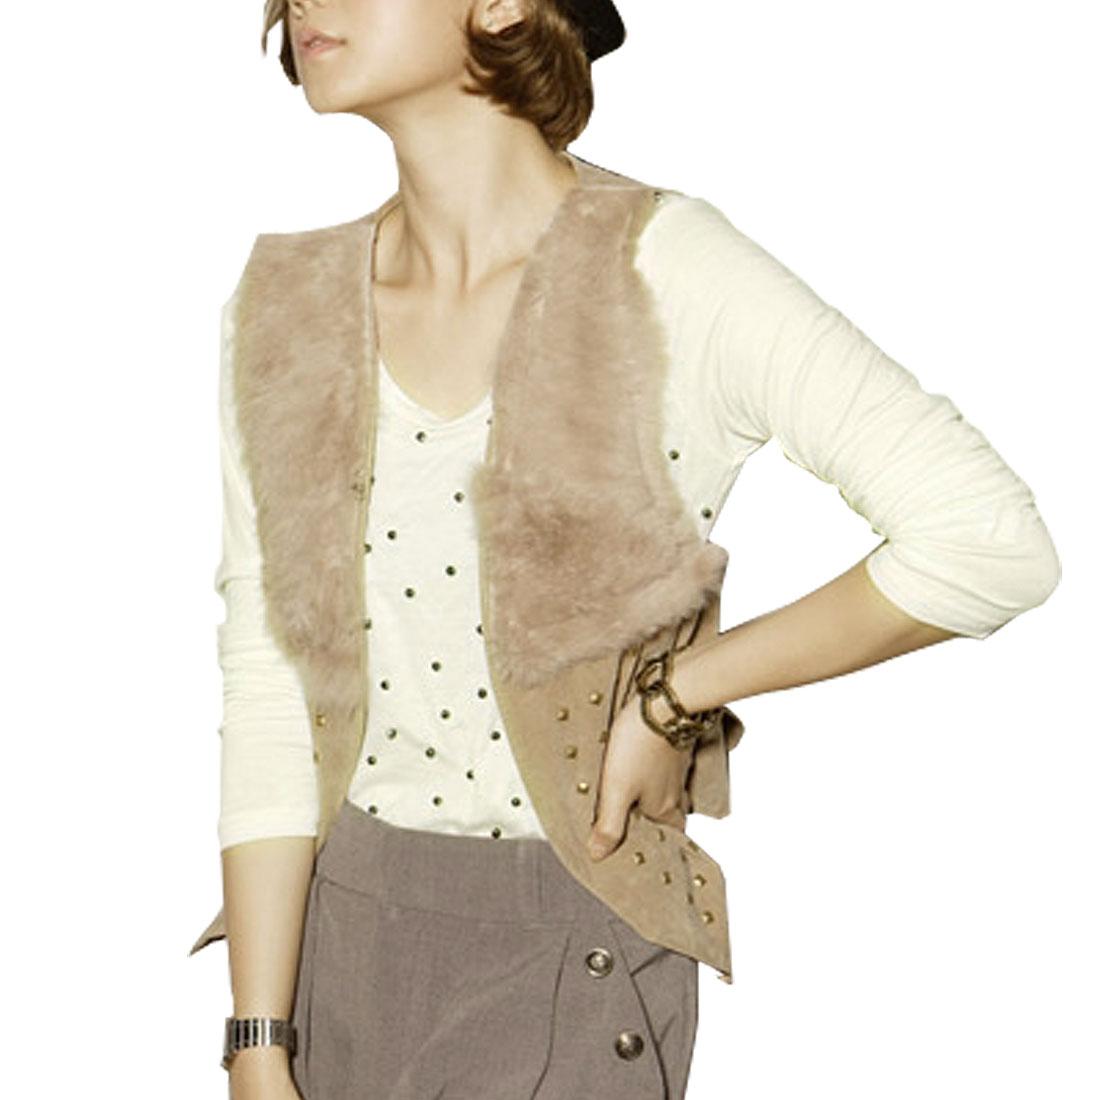 Ladies White Round Neck Long Sleeve Beads Detail Shirt Top XS